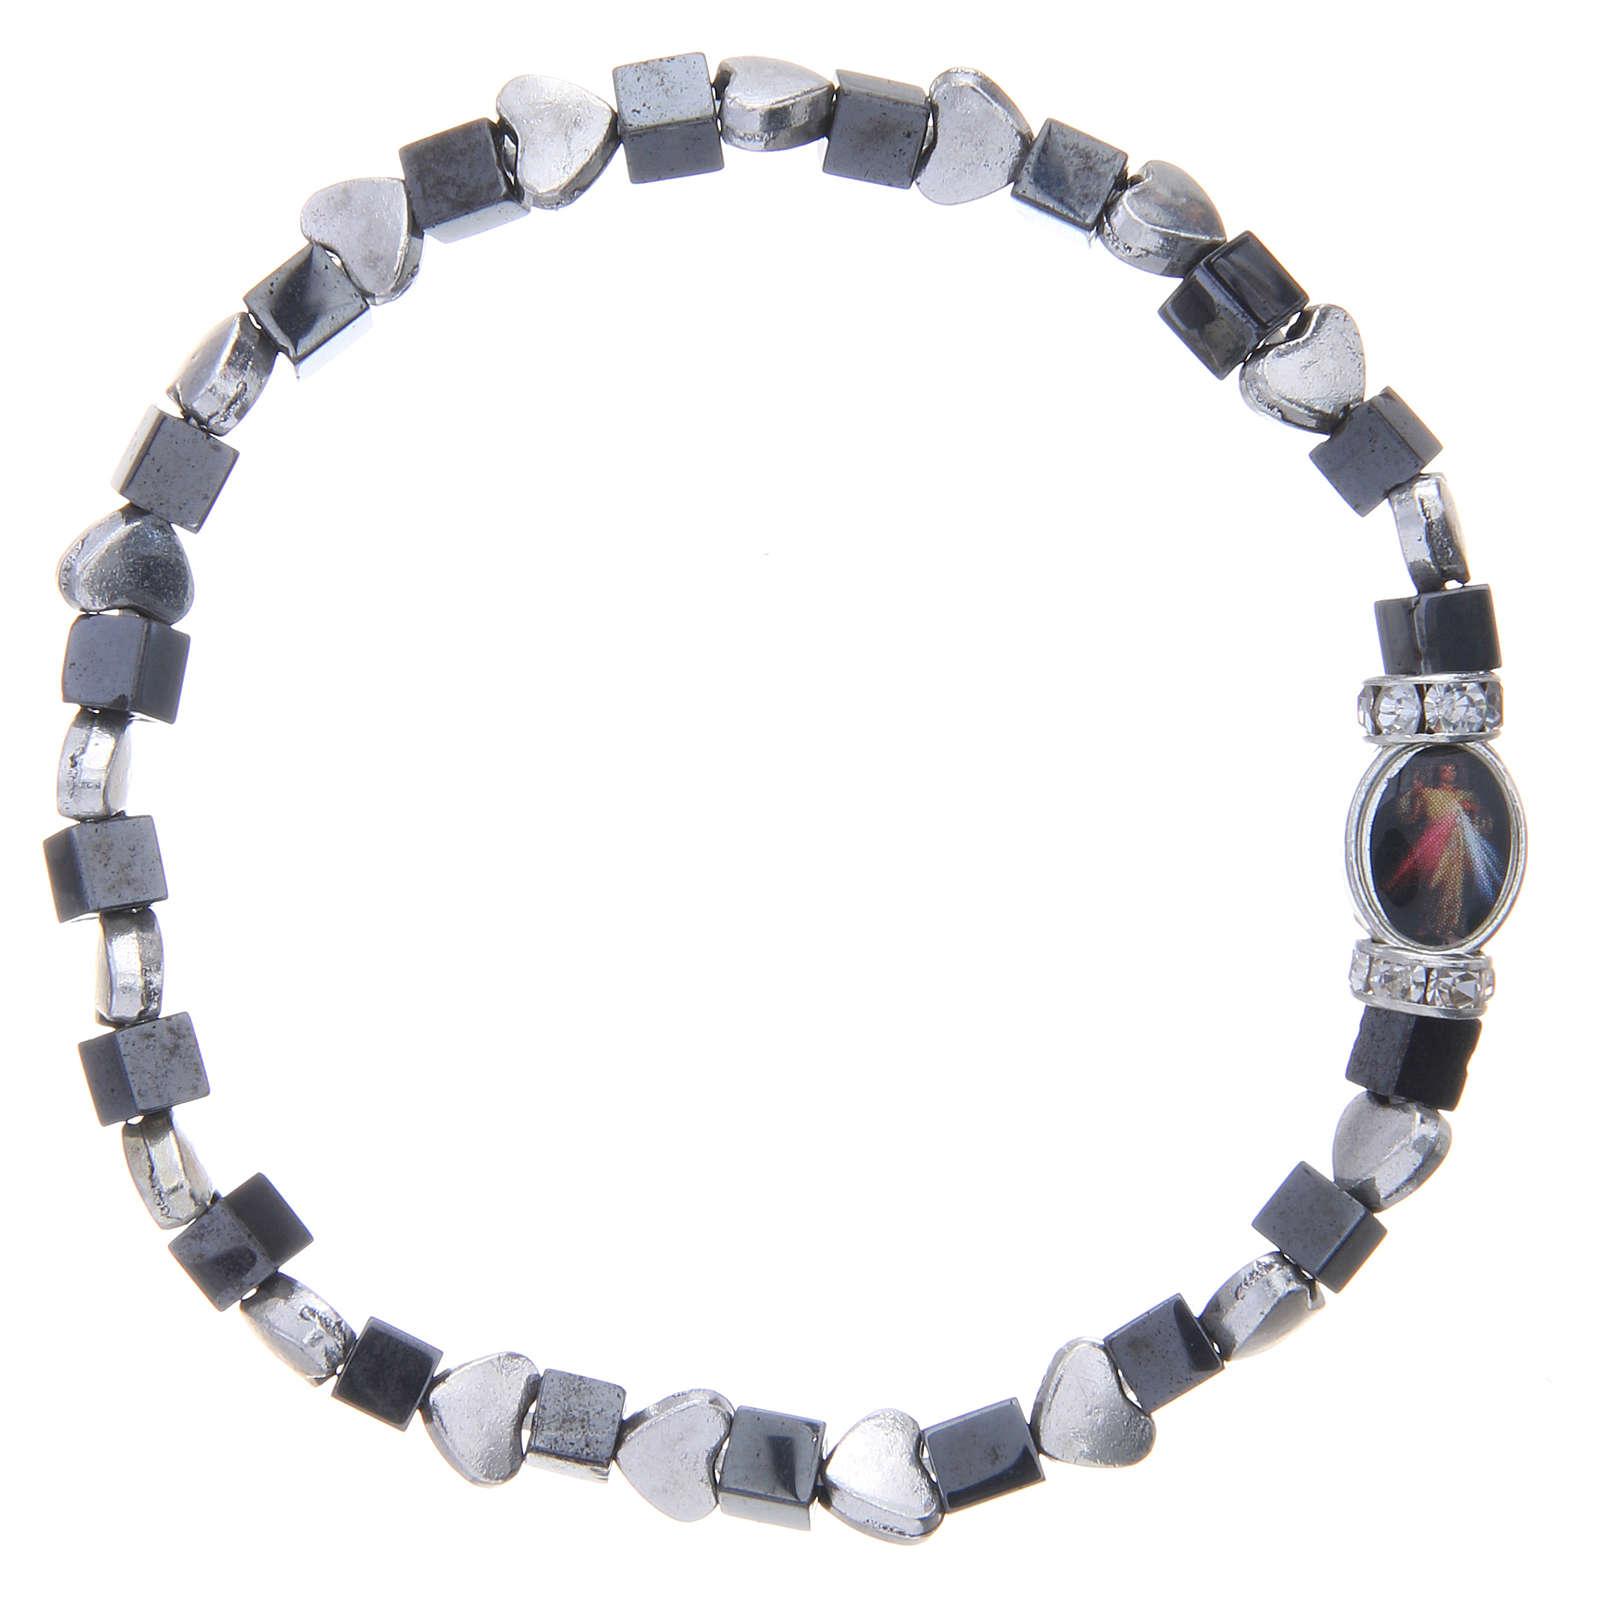 Bracelet Medjugorje hématite noire avec coeurs 4